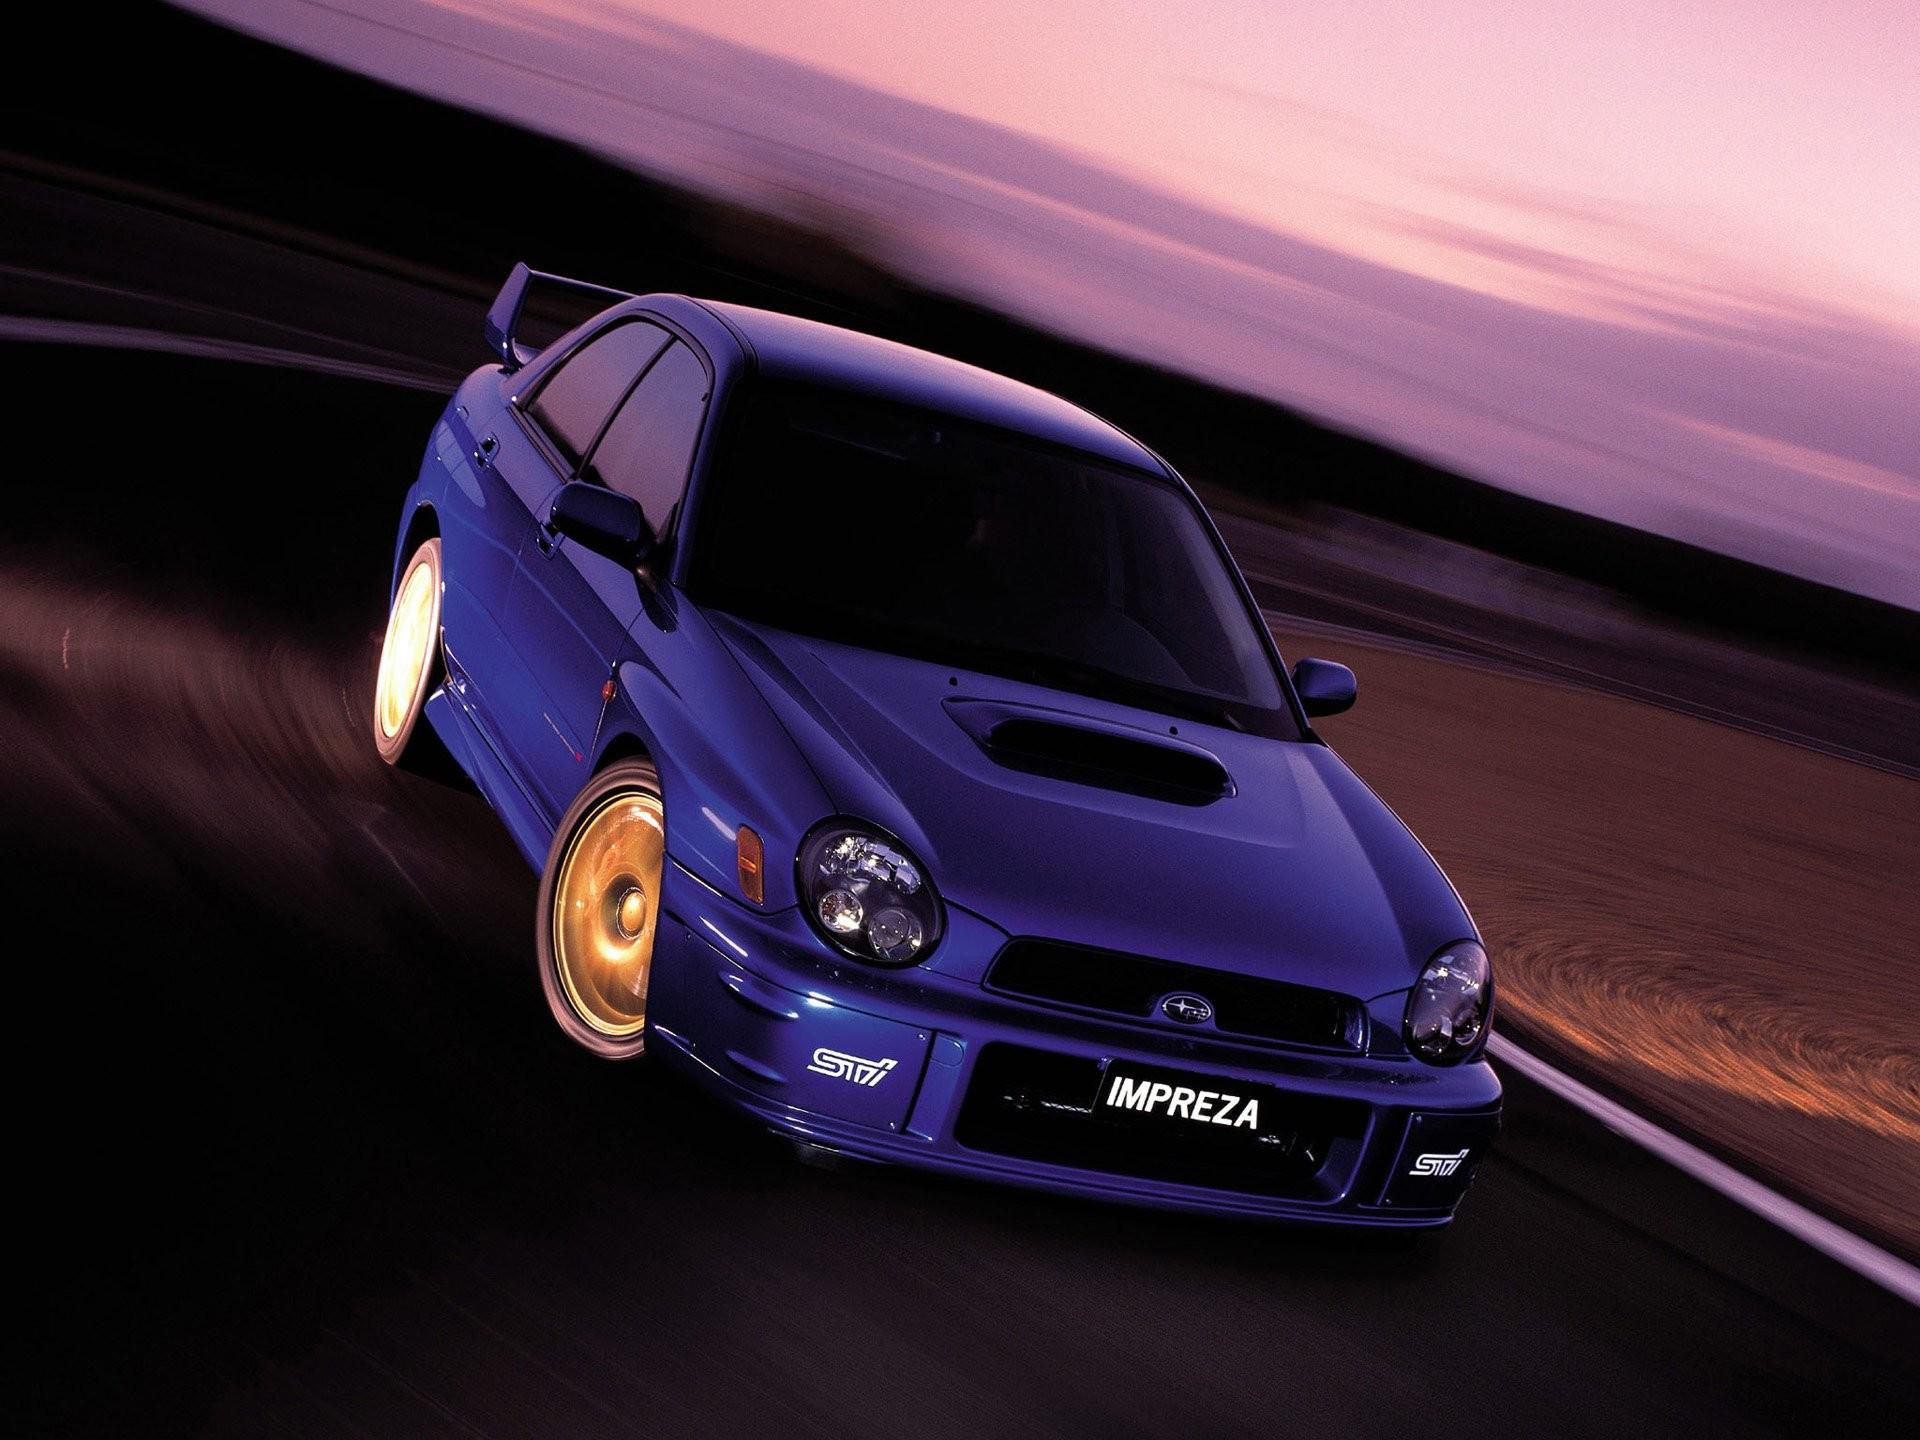 Subaru Rally Wallpaper Hd Subaru Wrx Wallpaper Hd 68 Images